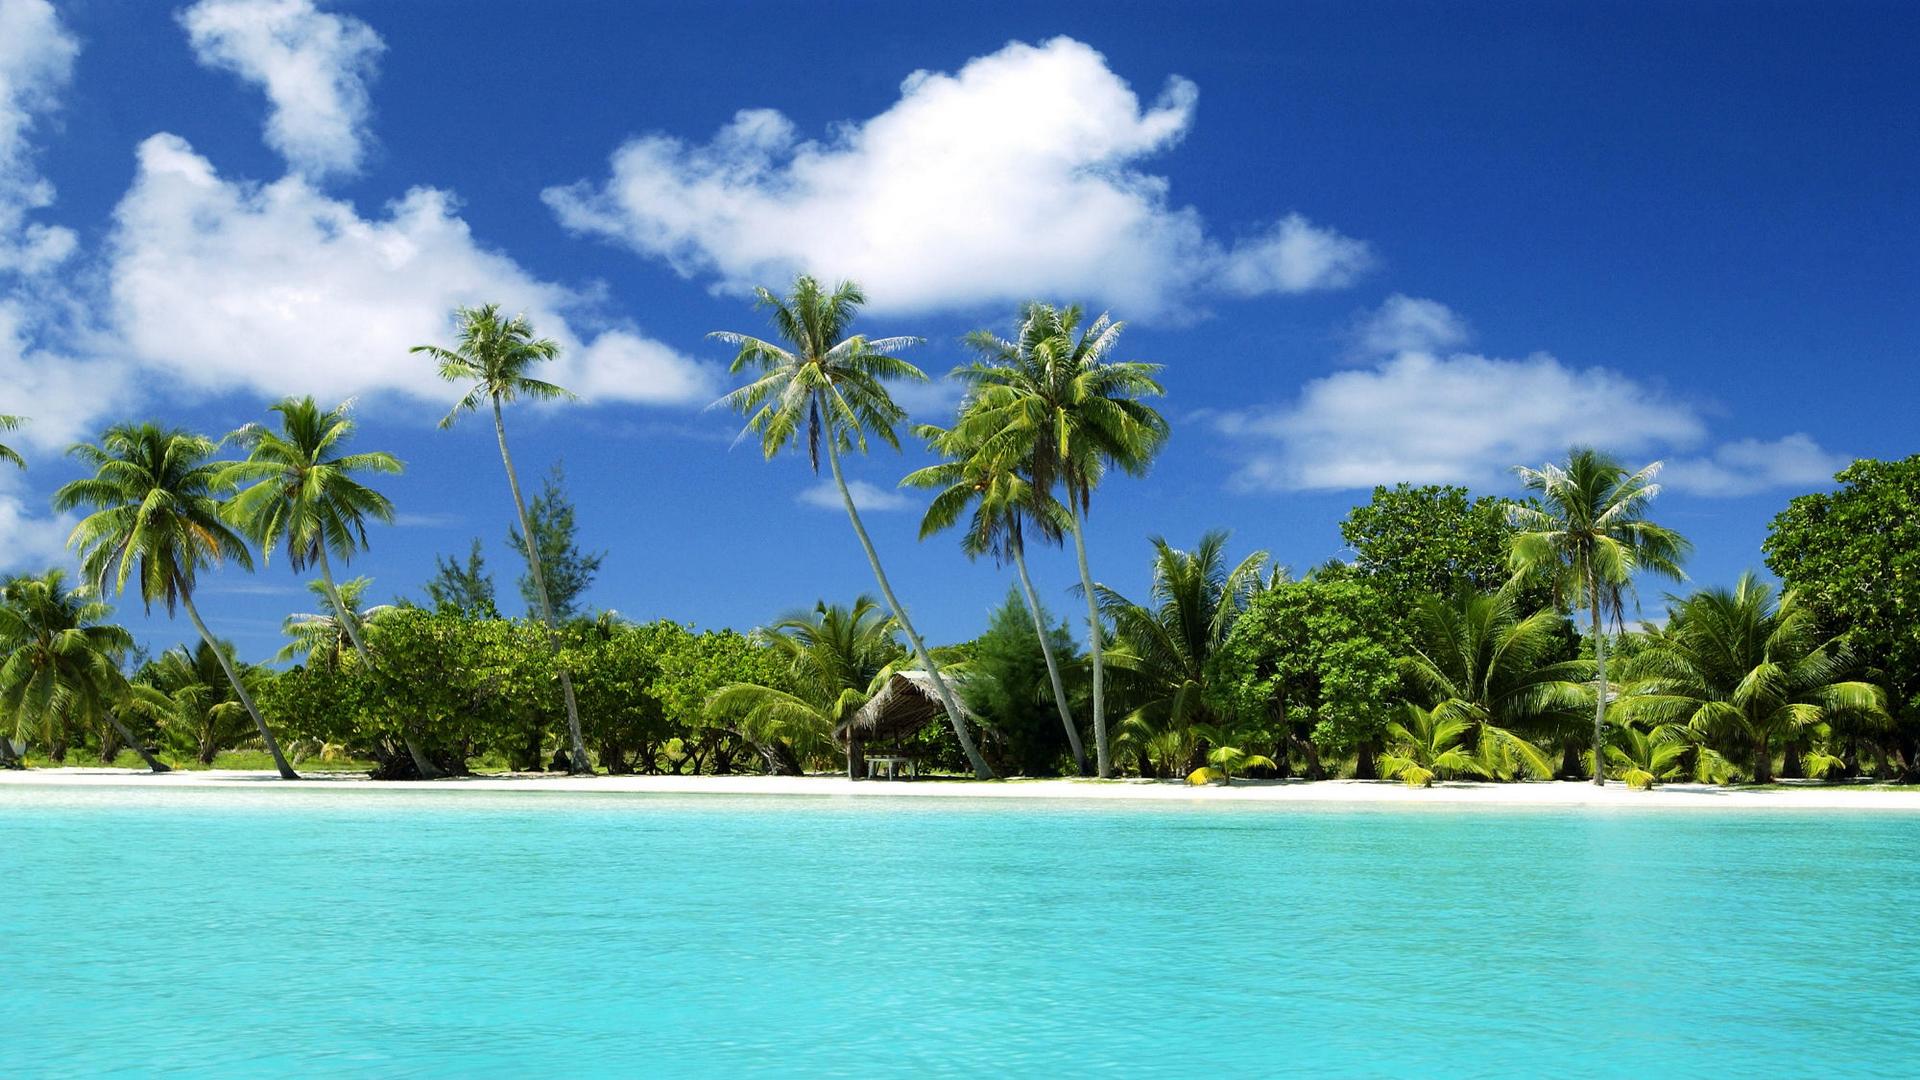 Tropical Beach Hd Wallpaper: Tropical Desktop Wallpaper